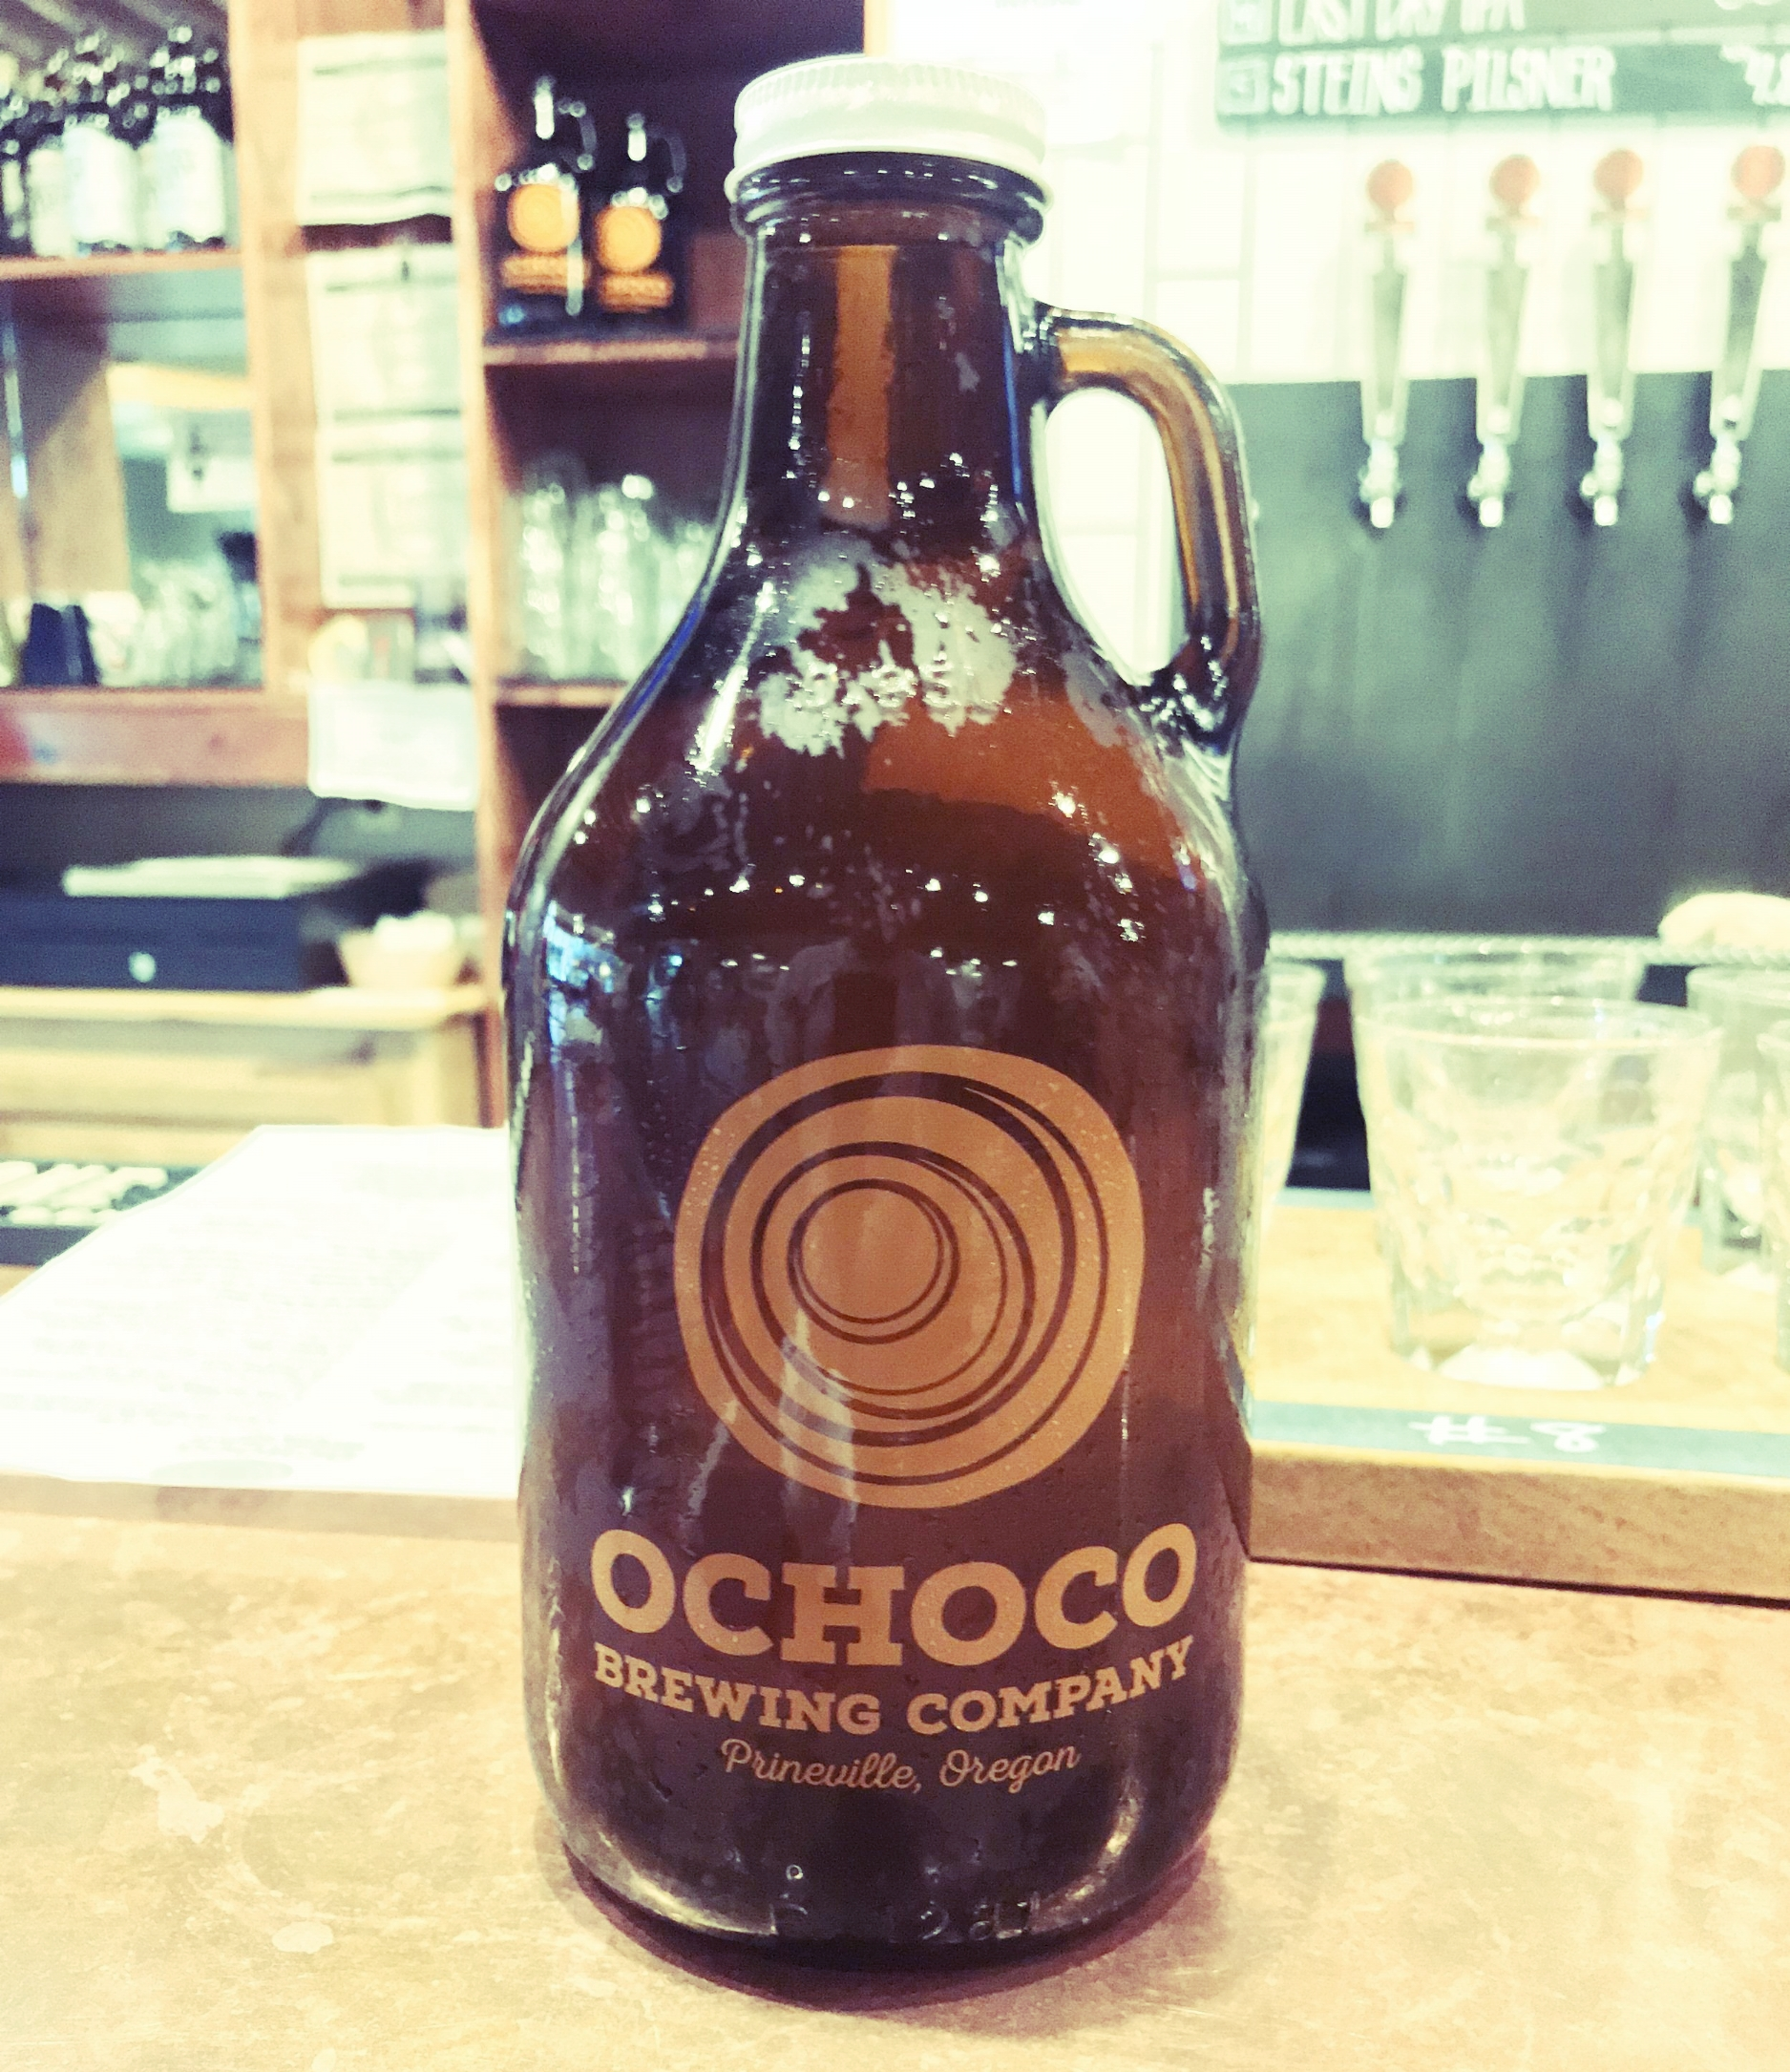 Ochoco Brewing Company